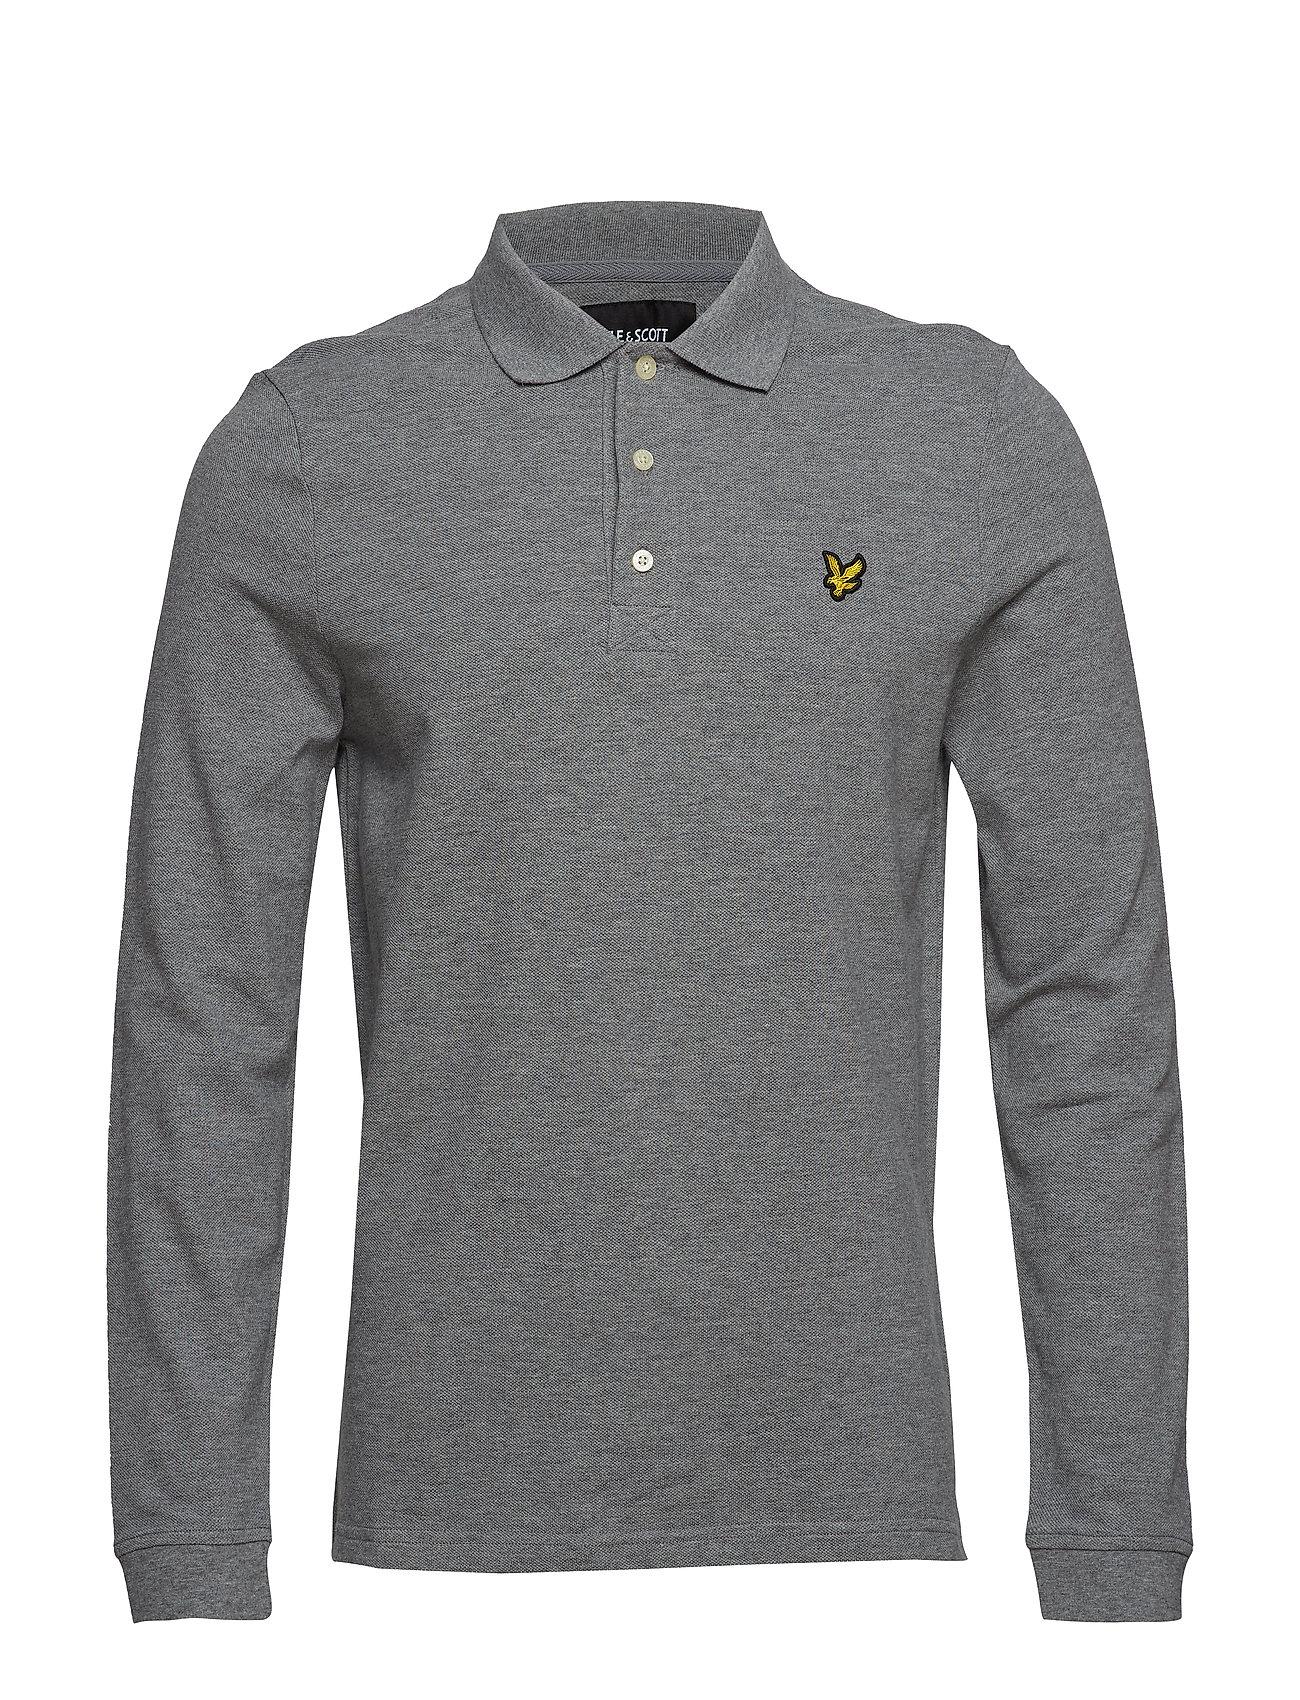 Lyle & Scott LS Polo Shirt - MID GREY MARL